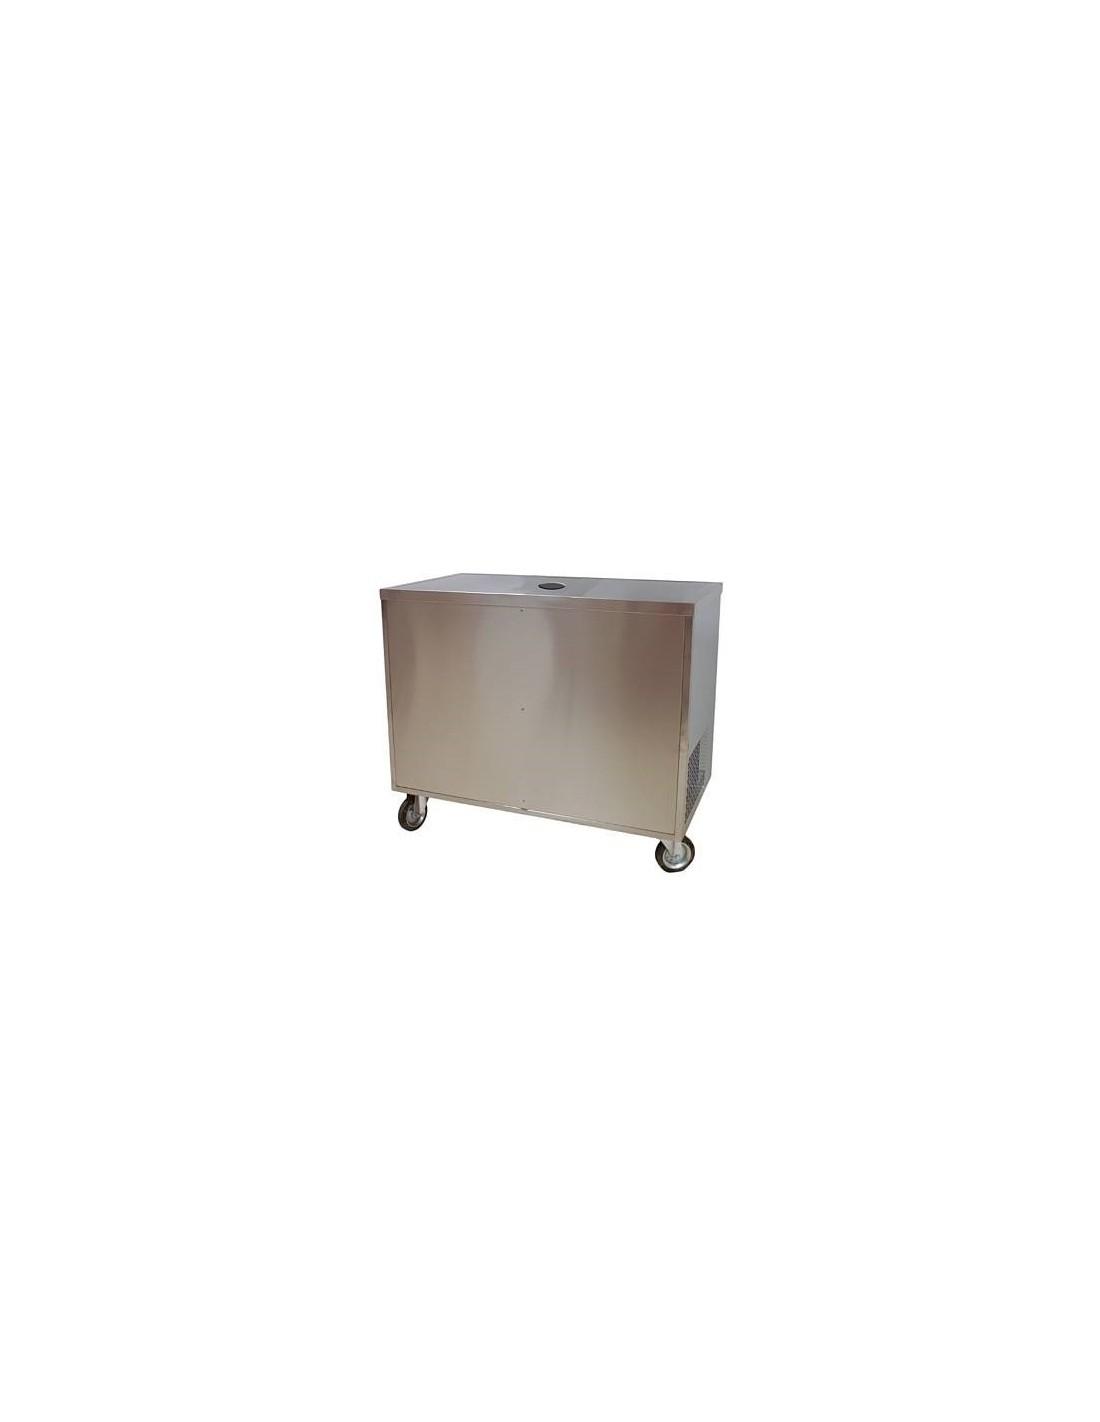 VYS01846 - Bardiskar - Mobil bar 1200x650x1020